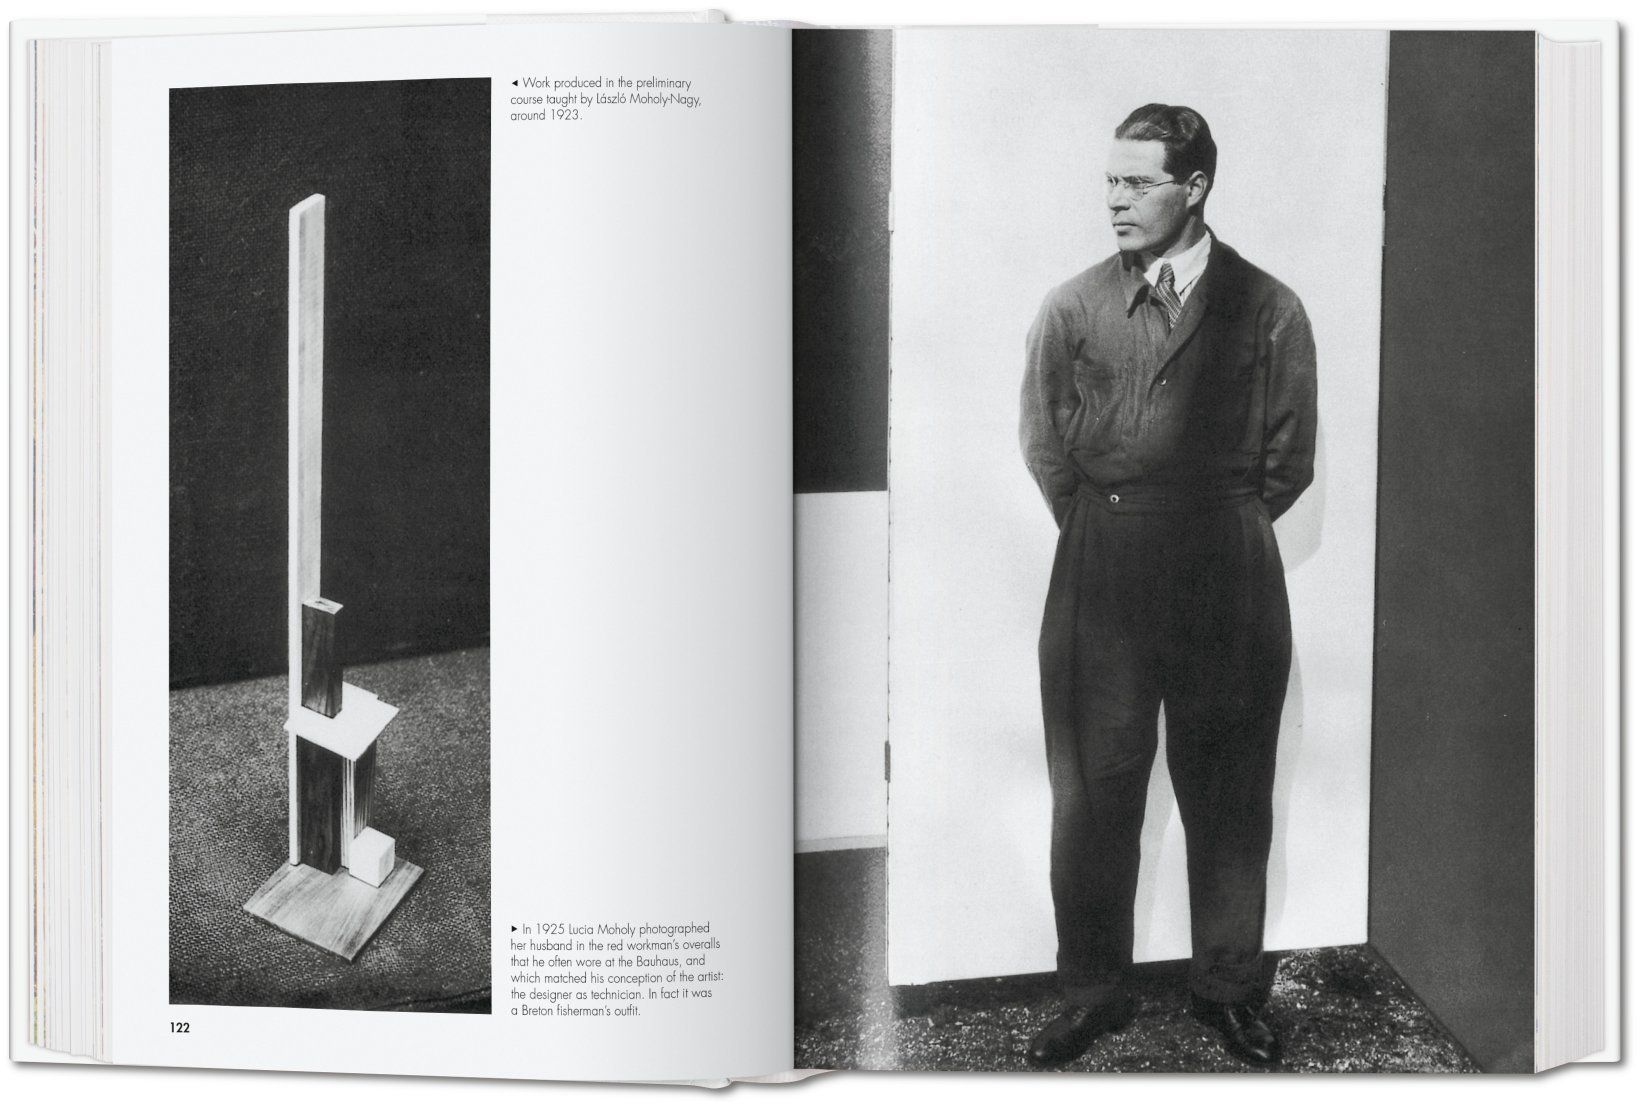 Bauhaus Updated Edition Study Art History Bauhaus Edition